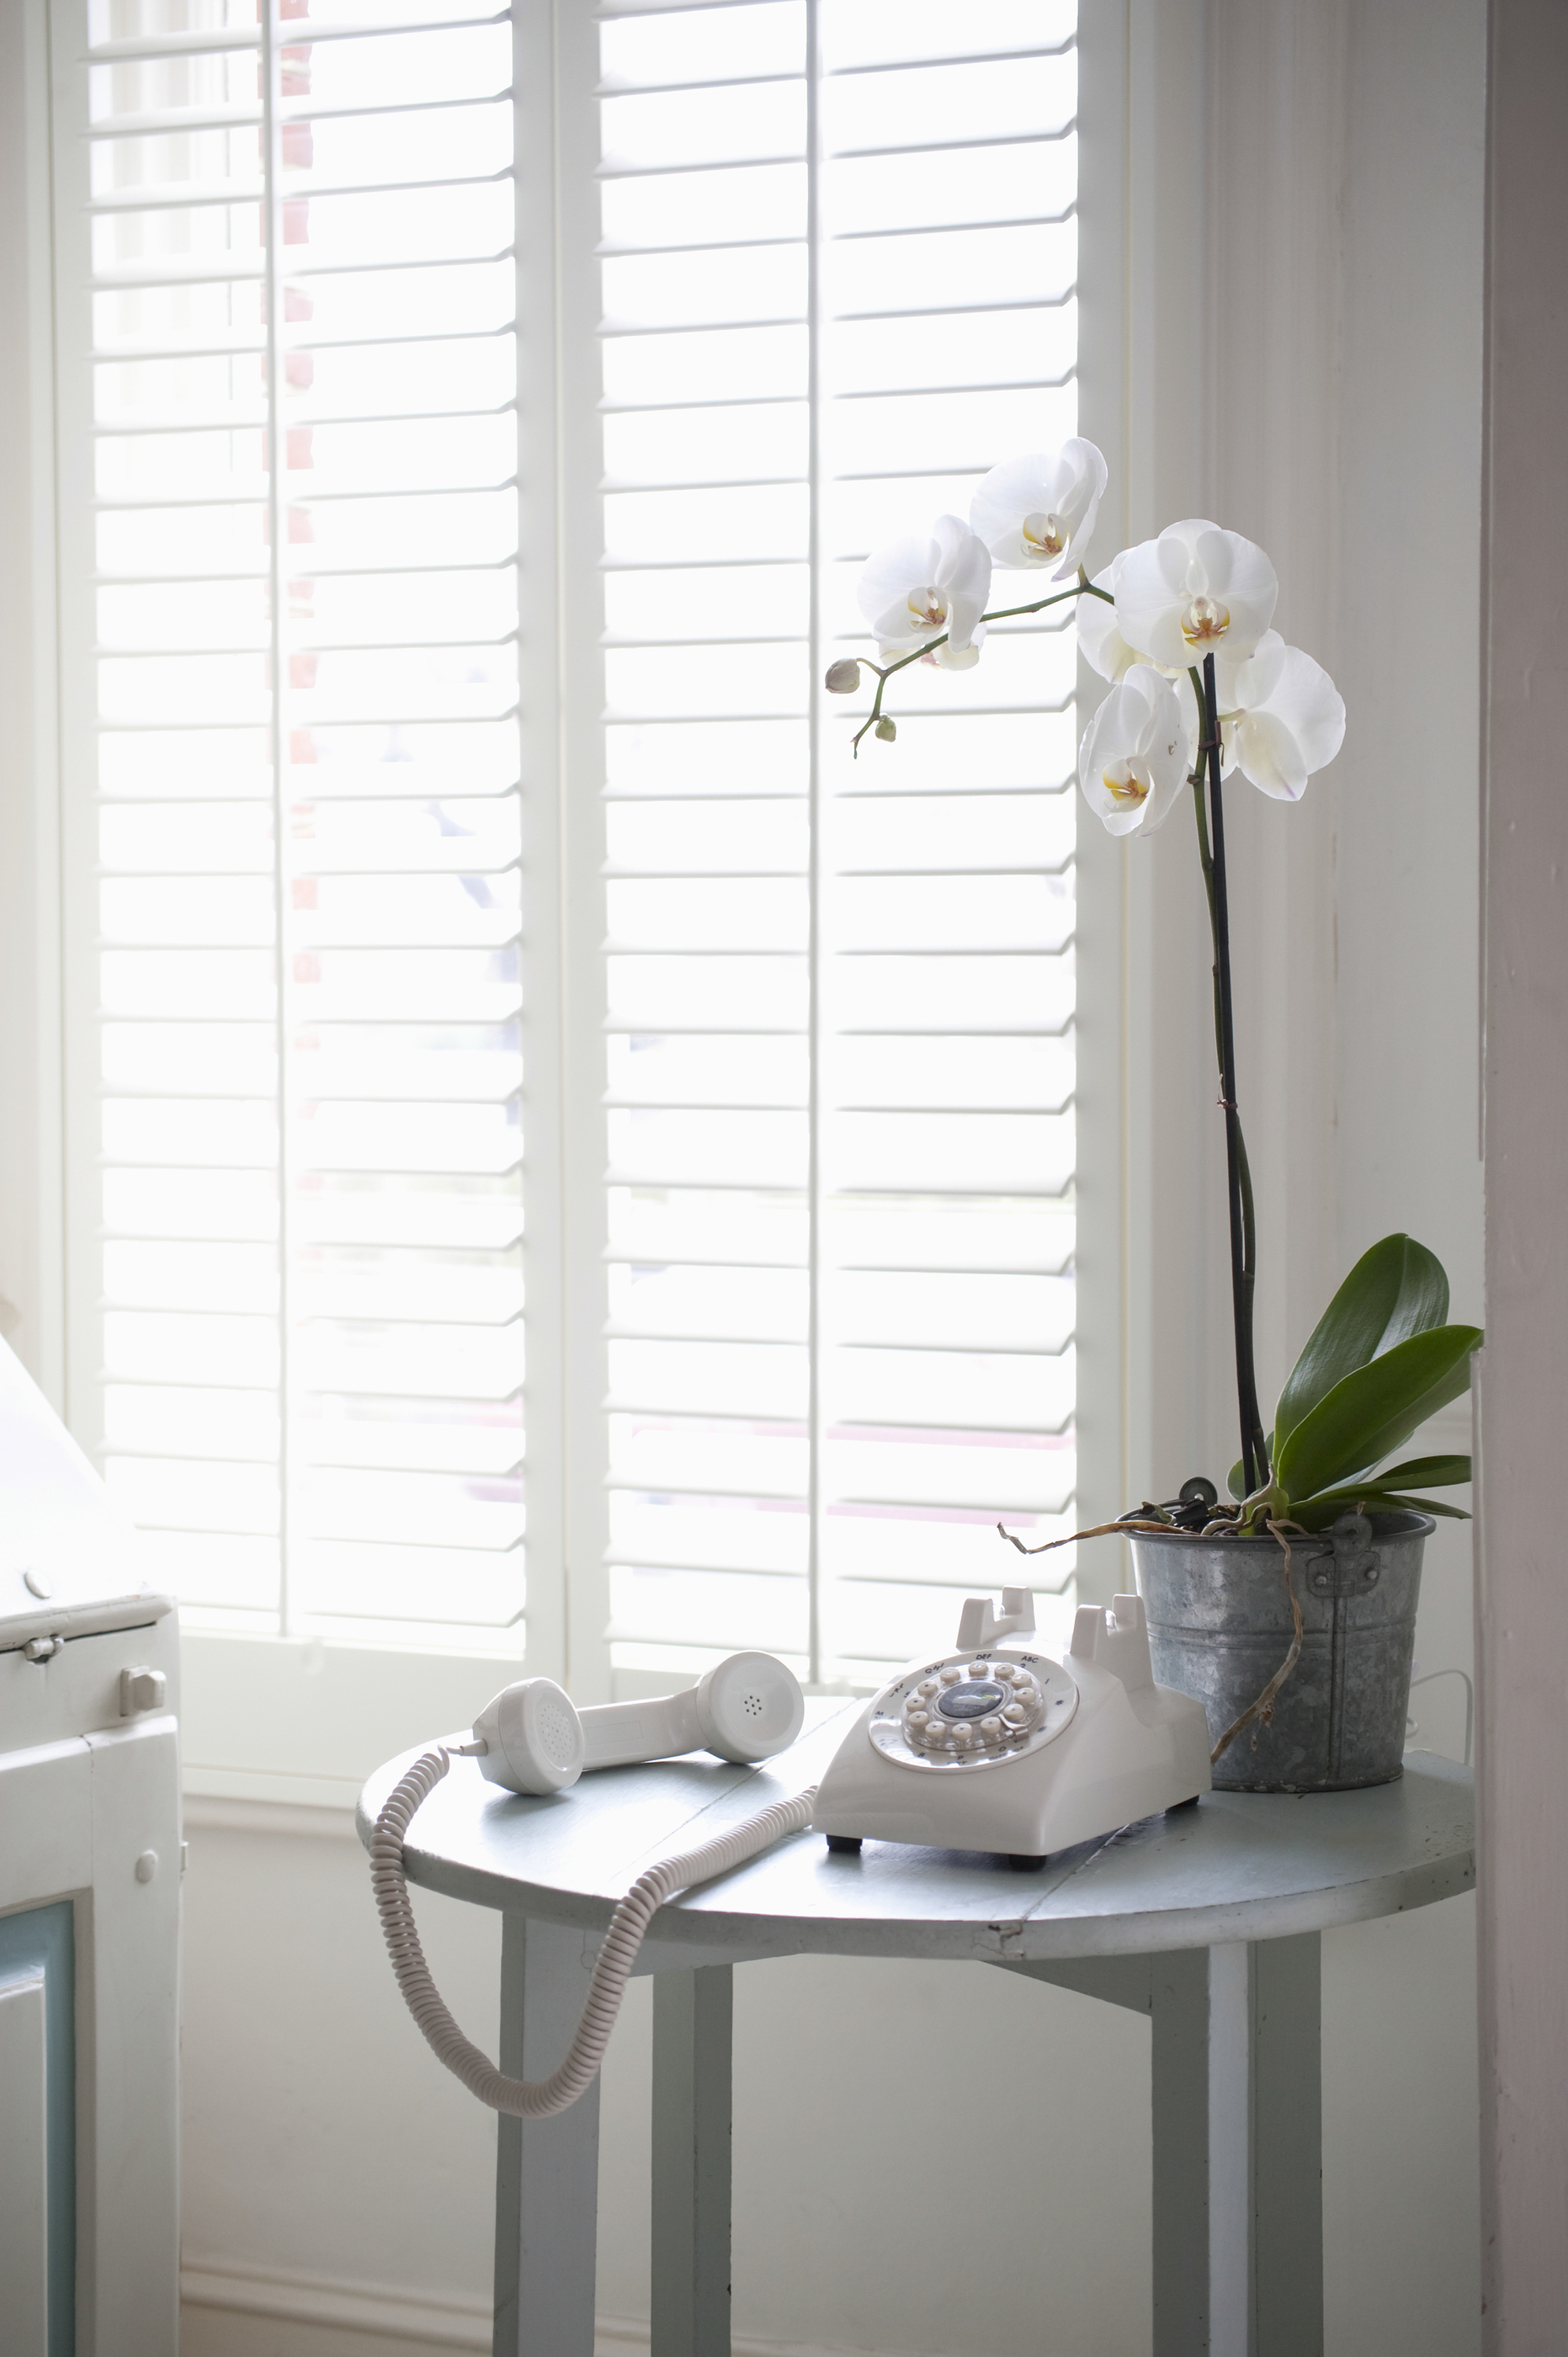 White solid window shutters Dorchester